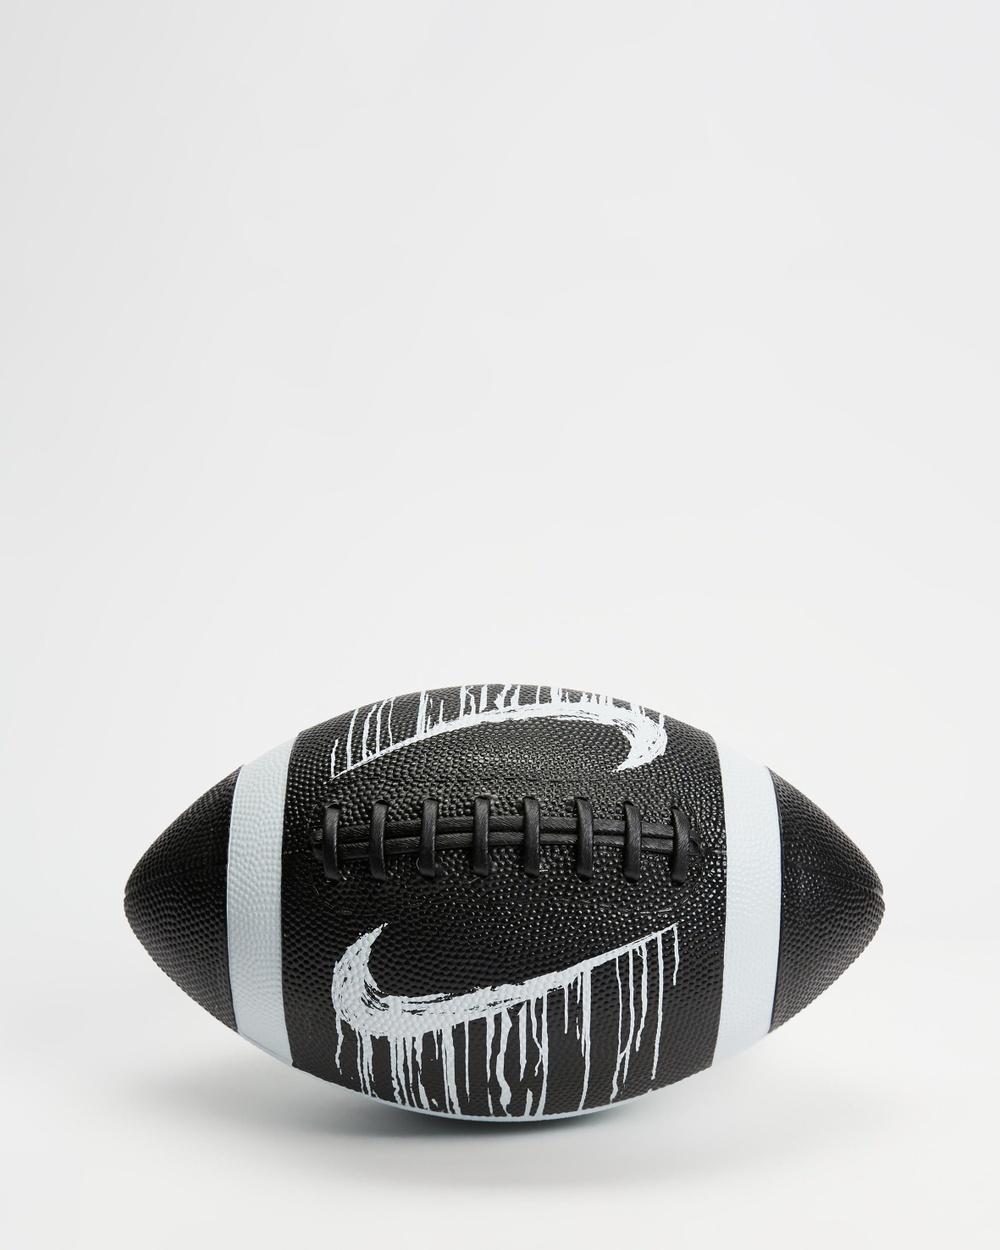 Nike Spin 4.0 Football Official Training Equipment Black & White